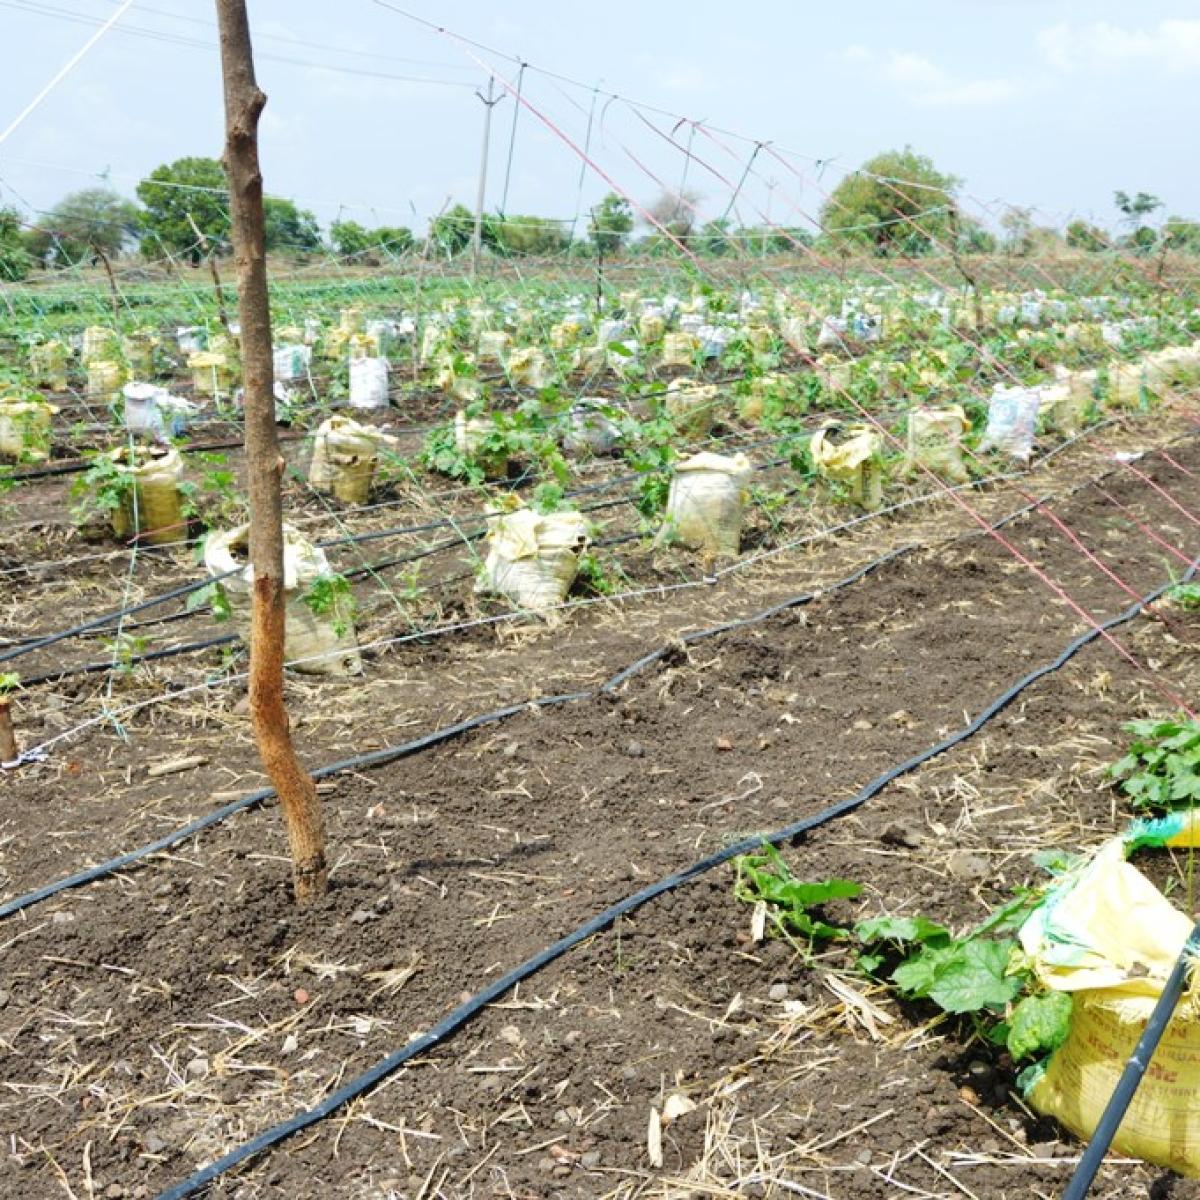 Bhikangaon: Agriculture PG student's method brings hope for marginal farmers